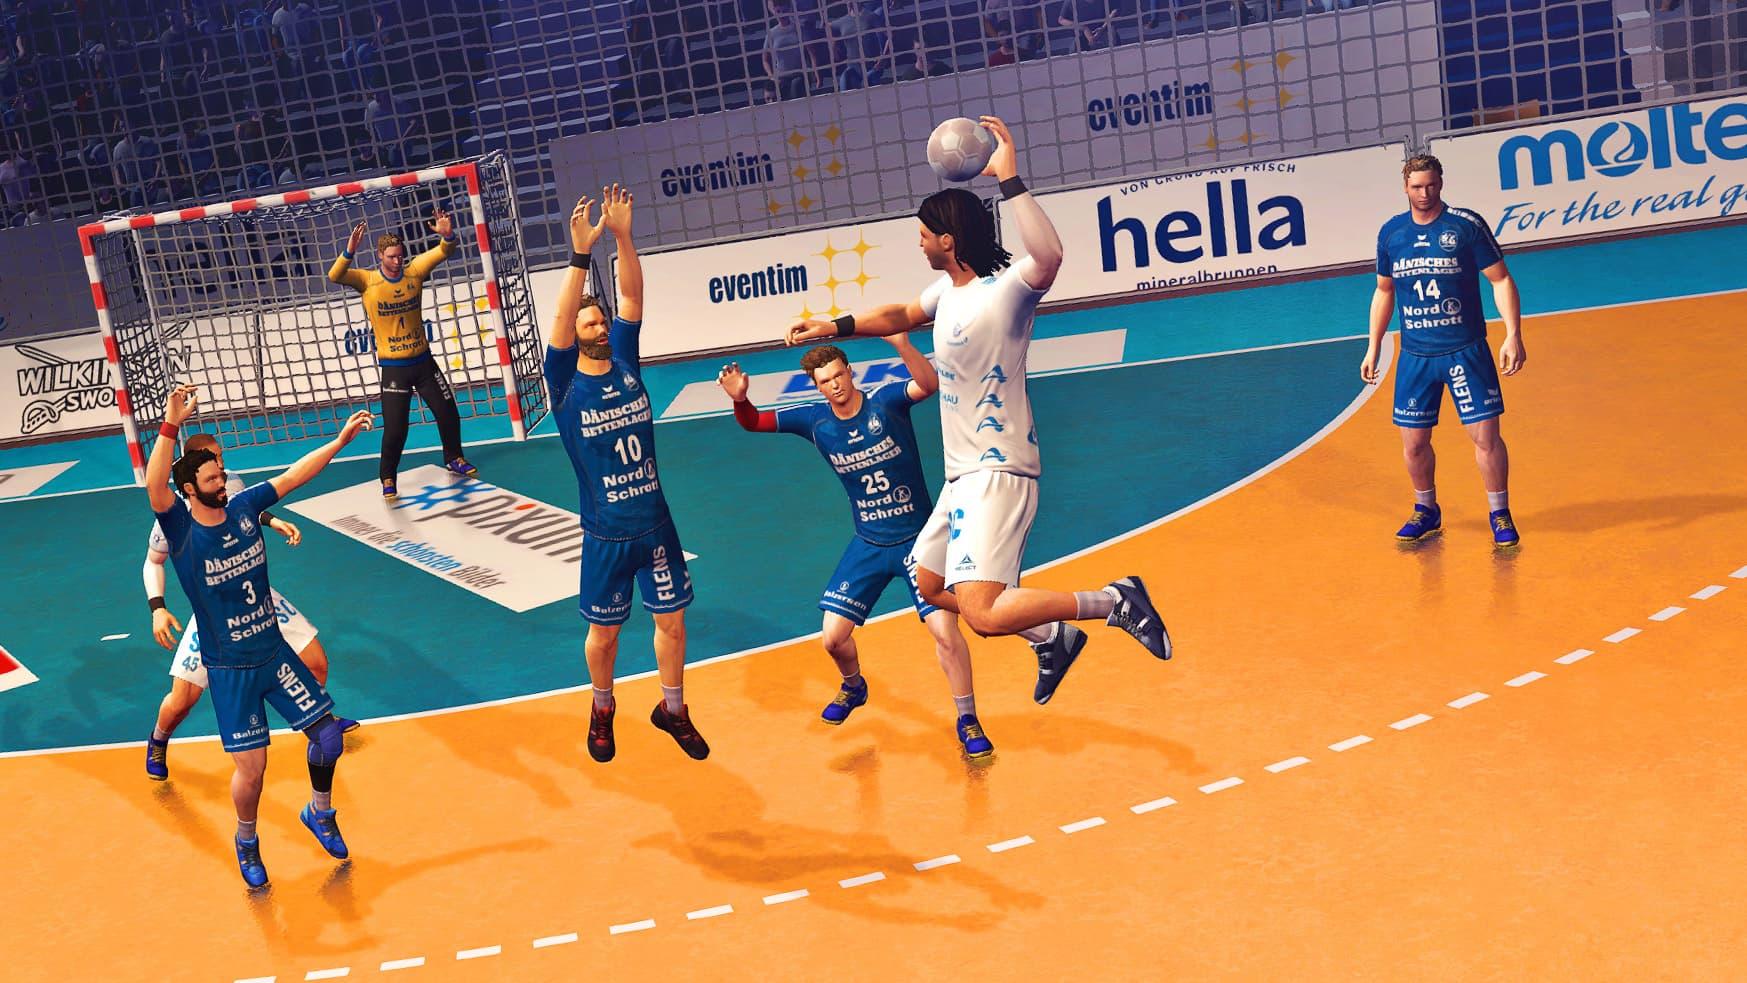 Handball 17 Xbox